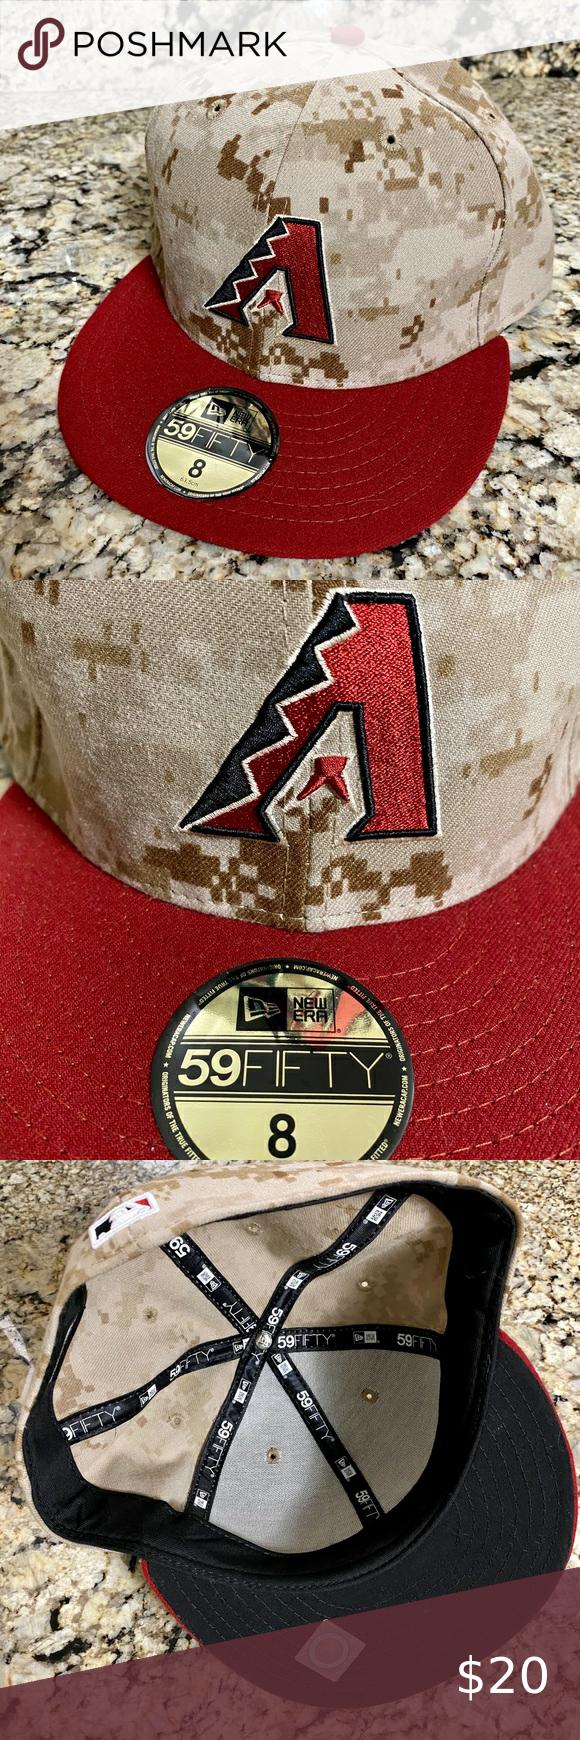 Arizona Diamondbacks New Era Hat New Era Hat New Era New Era Hats